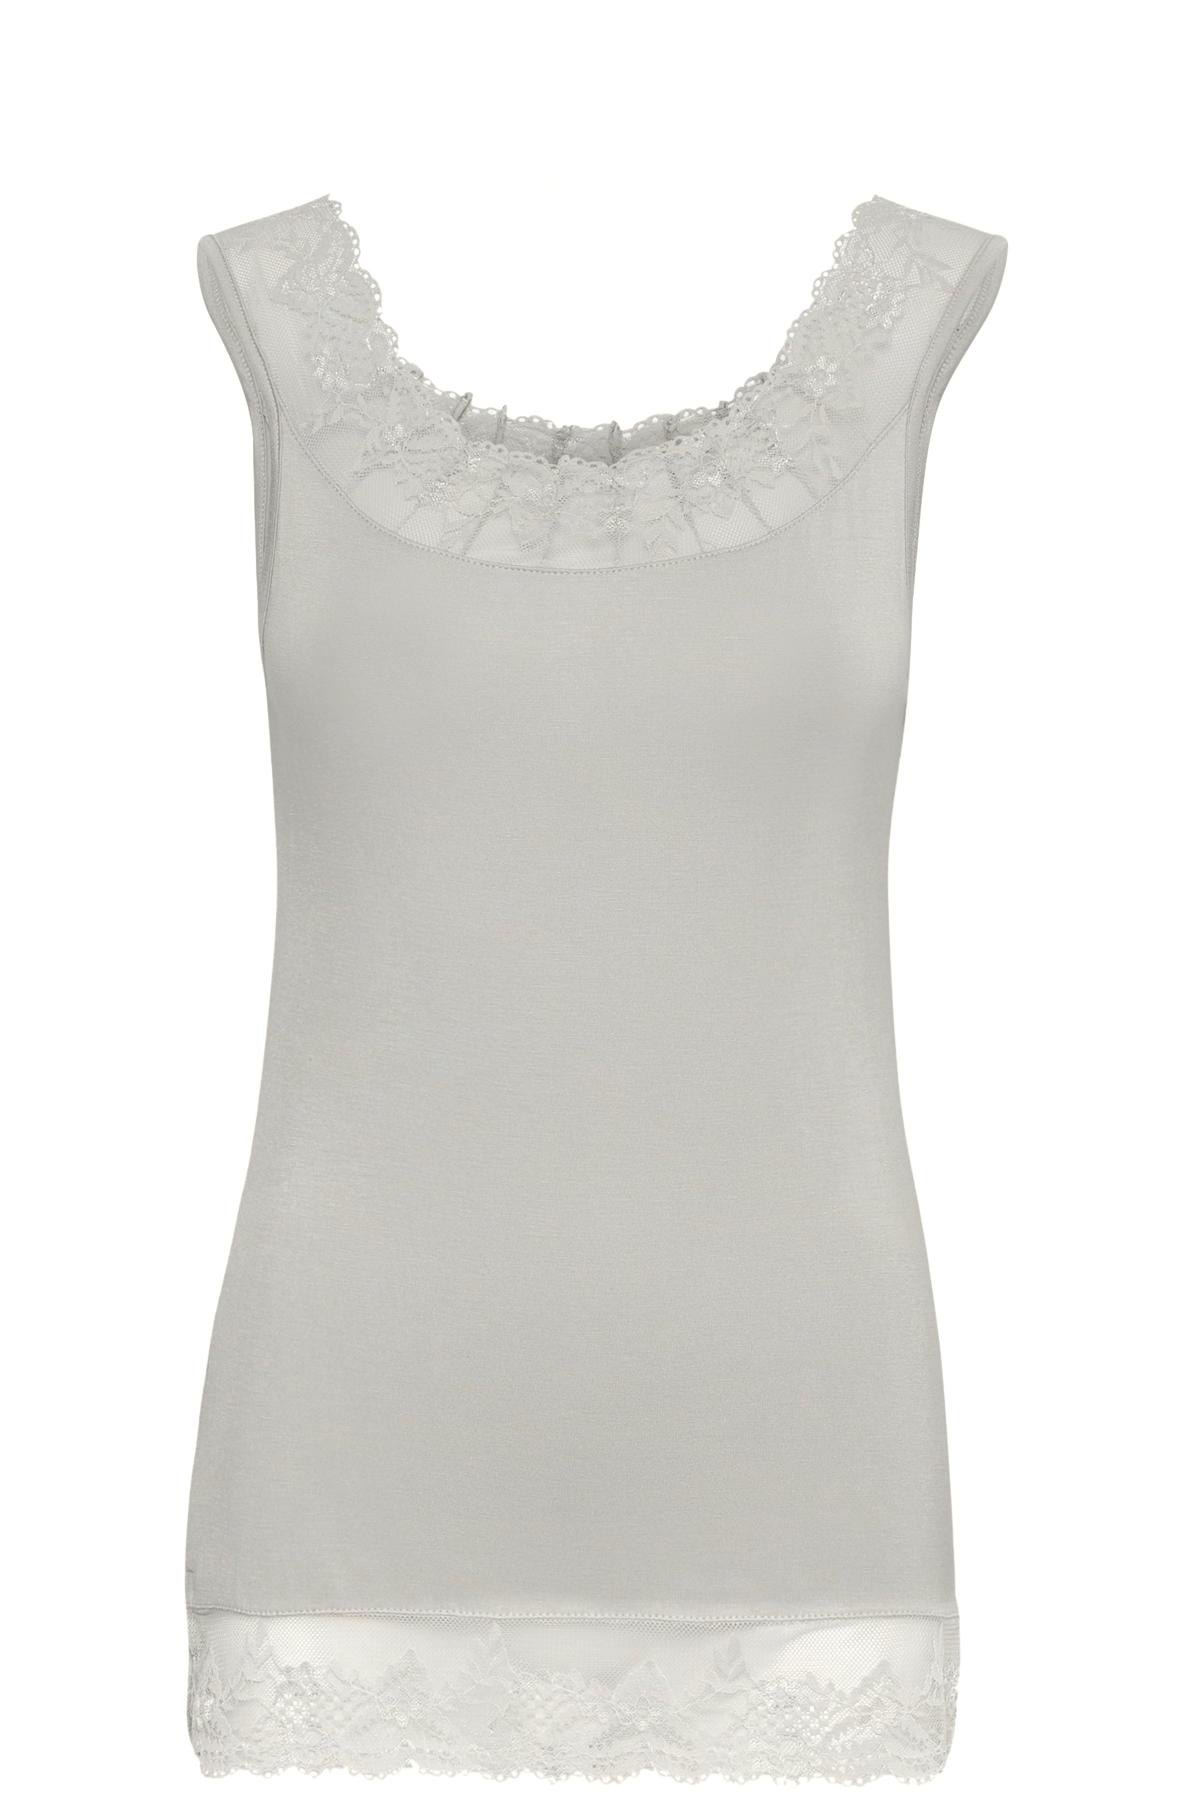 Image of Cream Dame Jerseytop - Lys gråmeleret